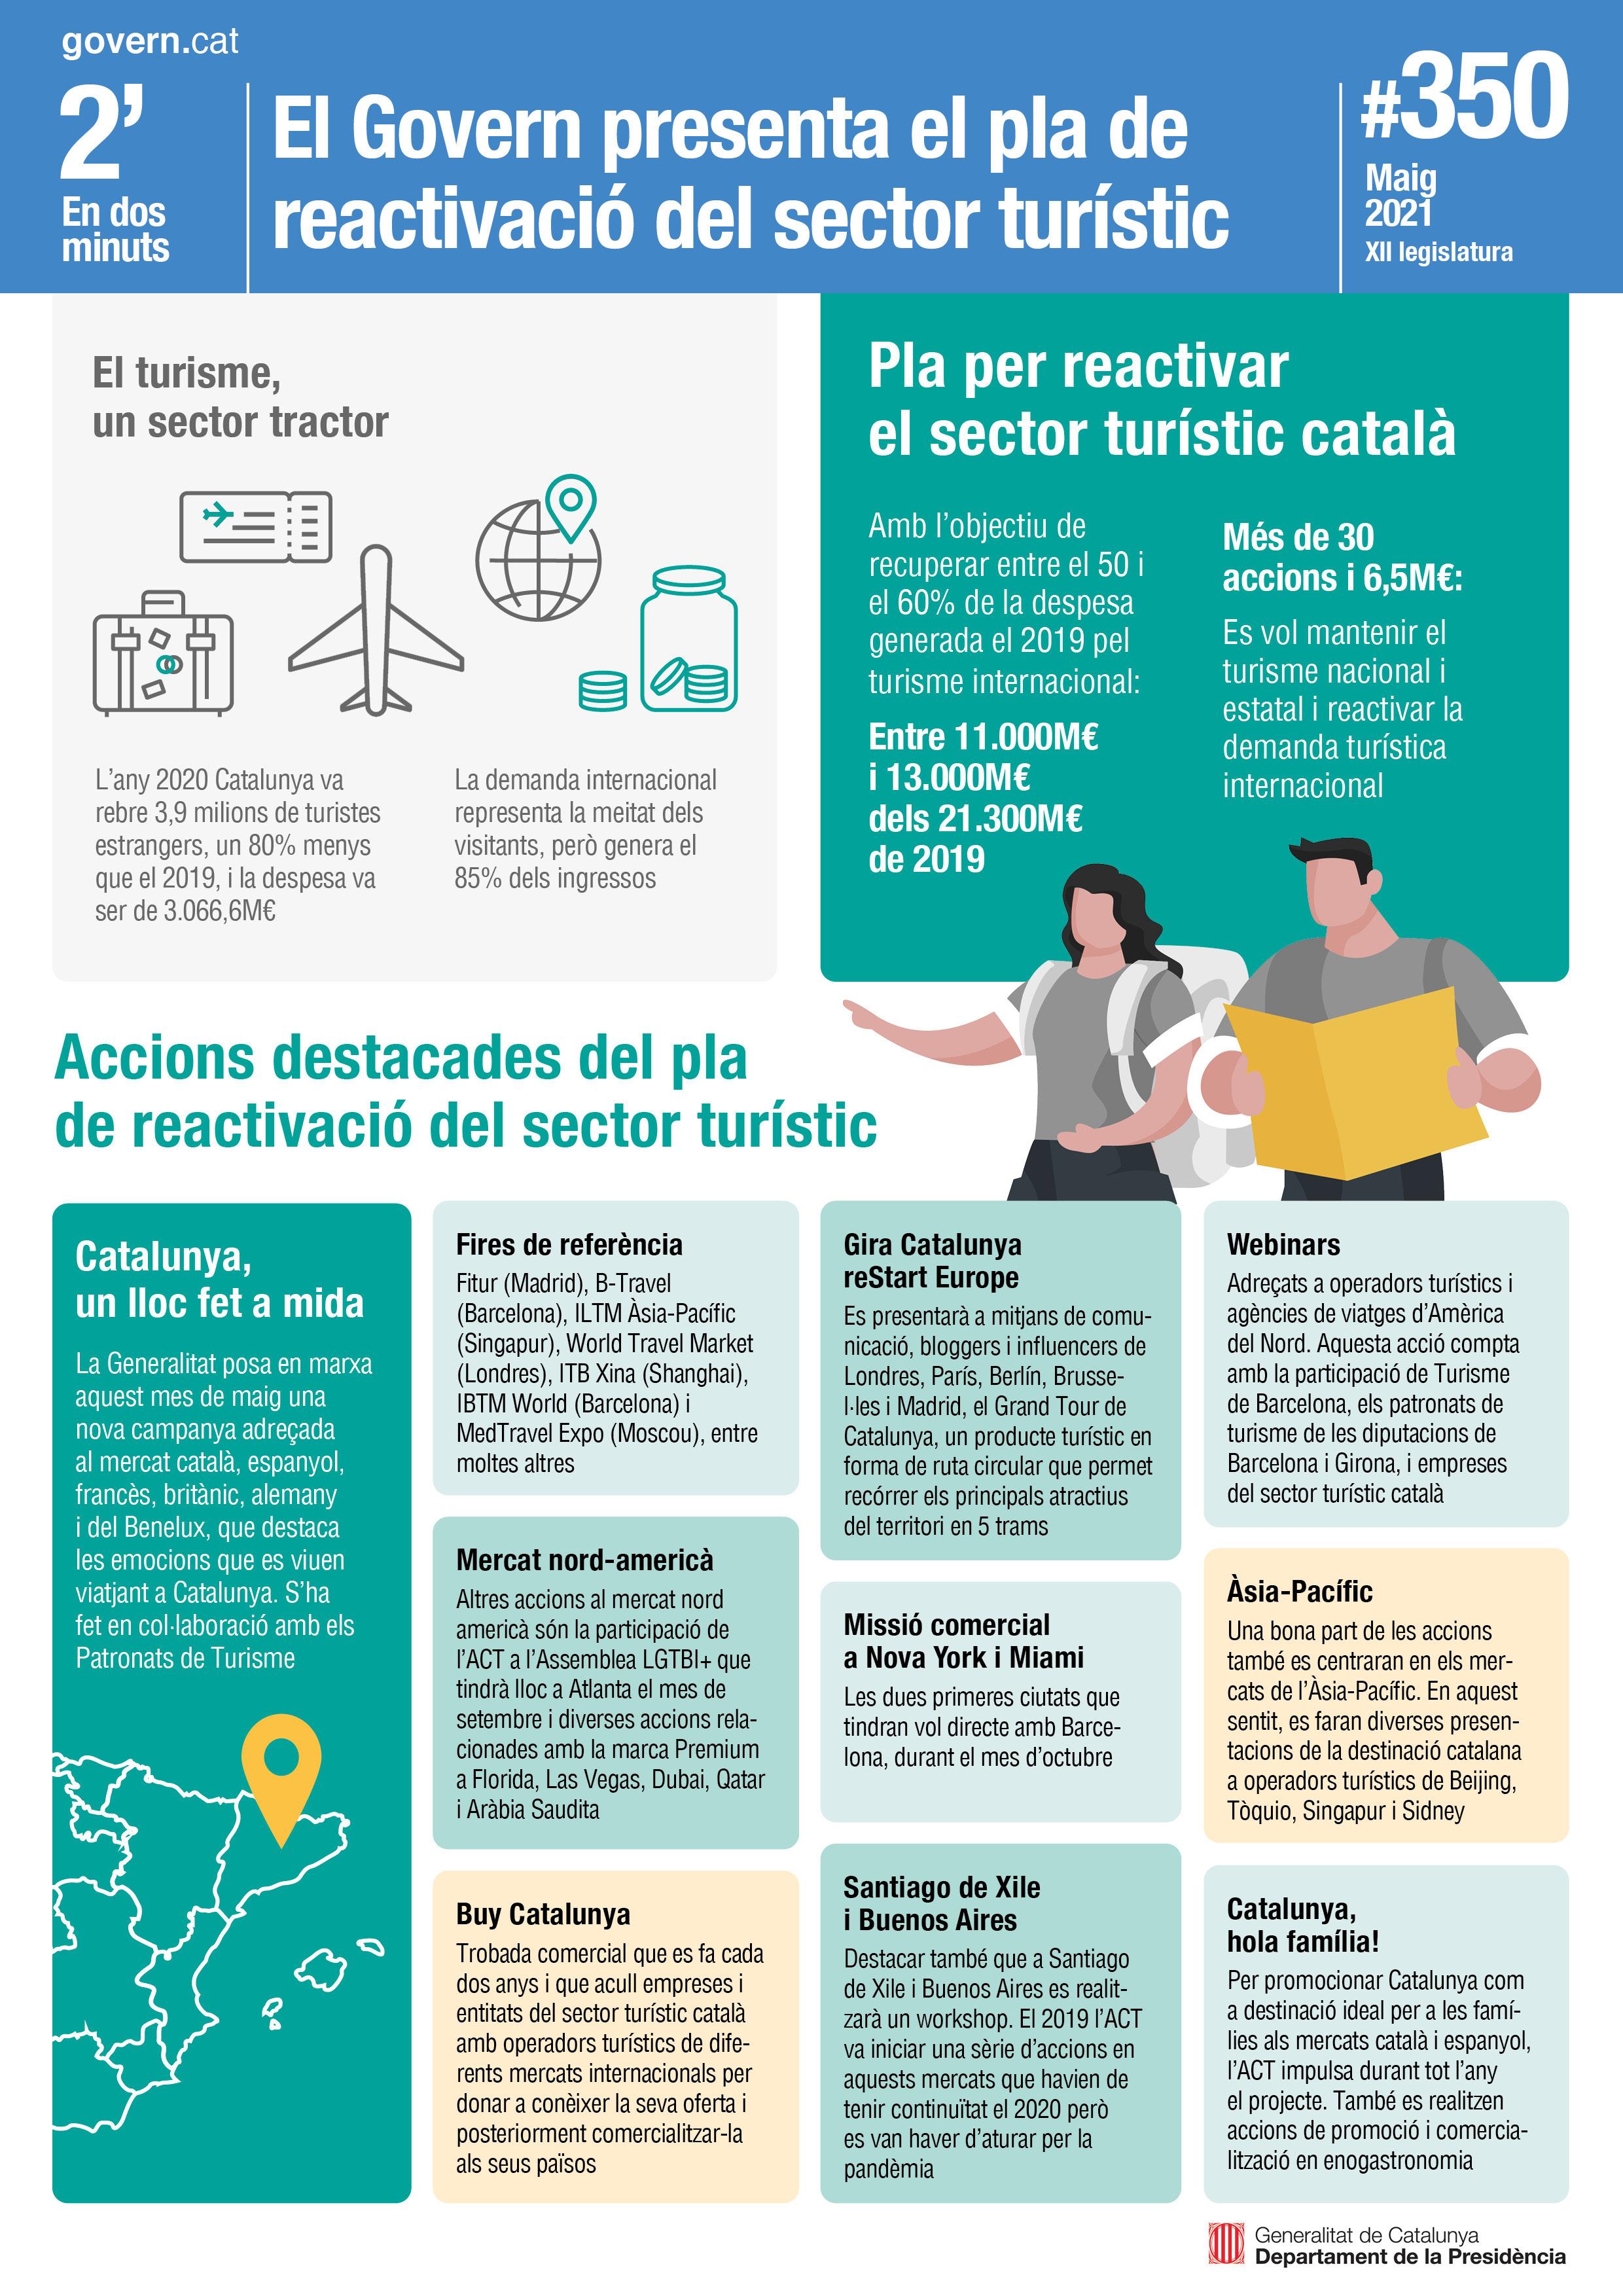 El Govern presenta el pla de reactivació del sector turístic